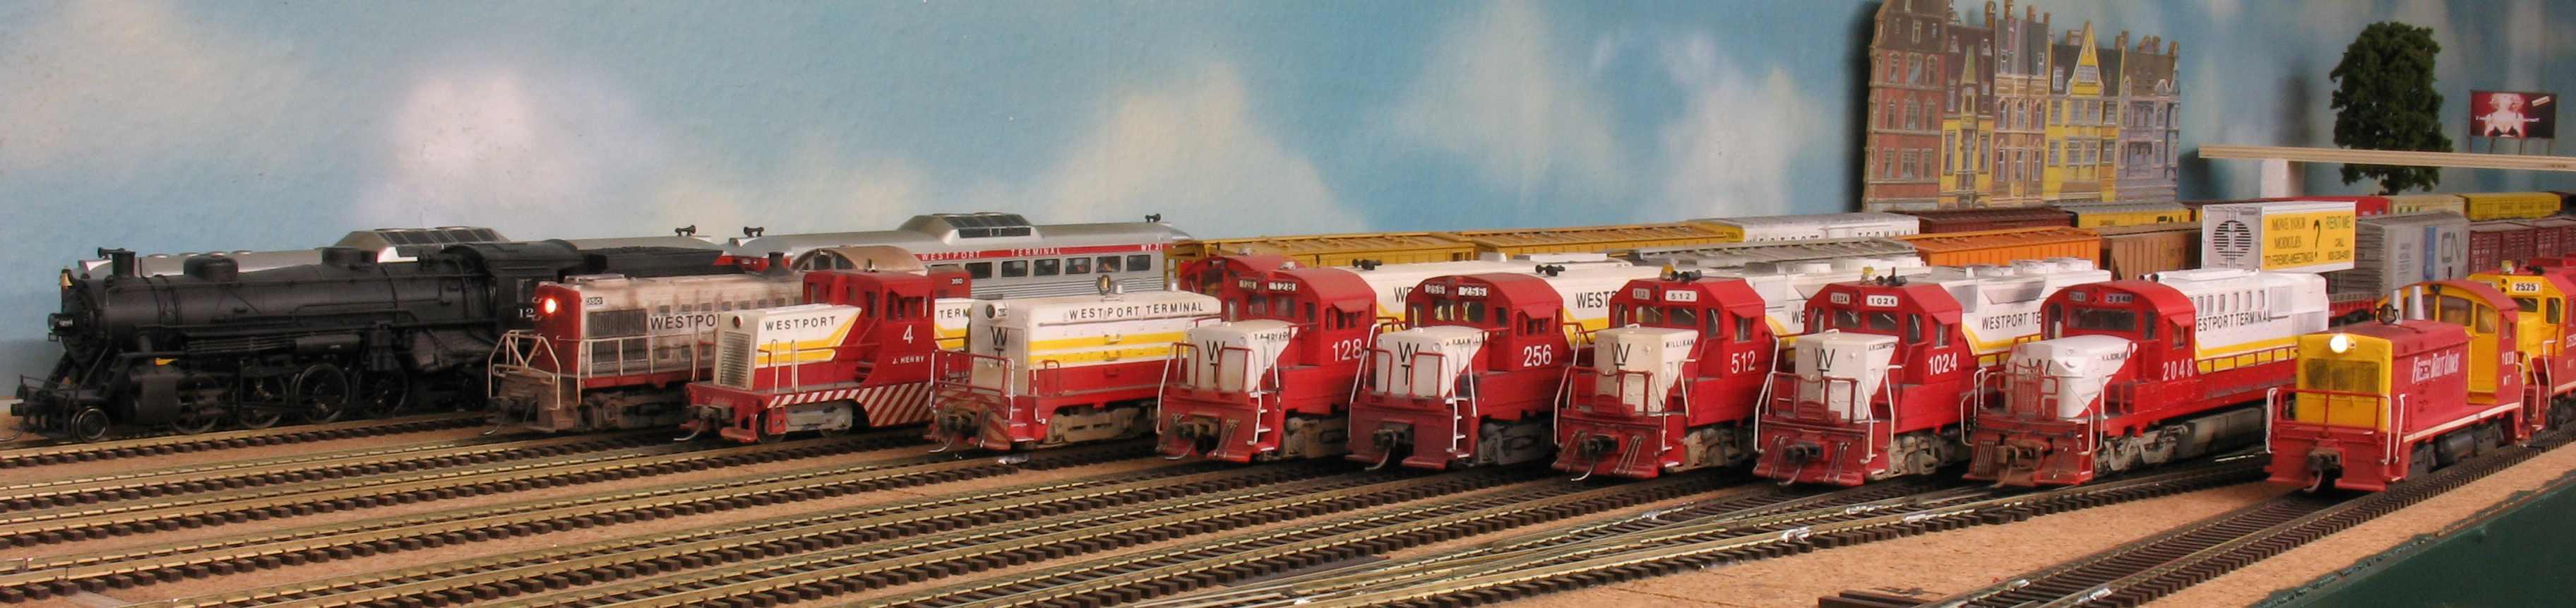 Freelance paint scheme help - Model Railroader Magazine